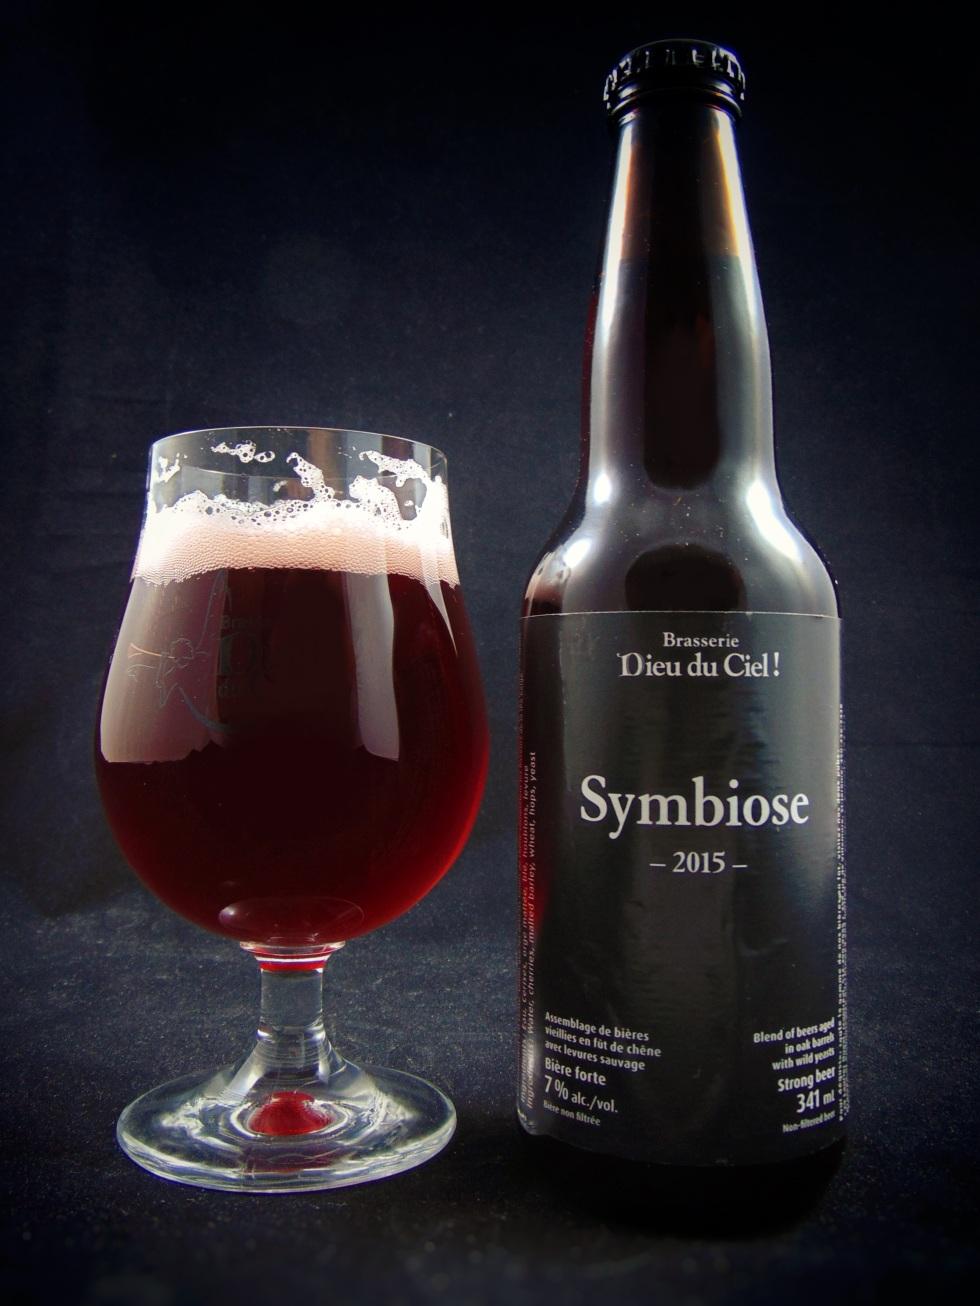 Symboise